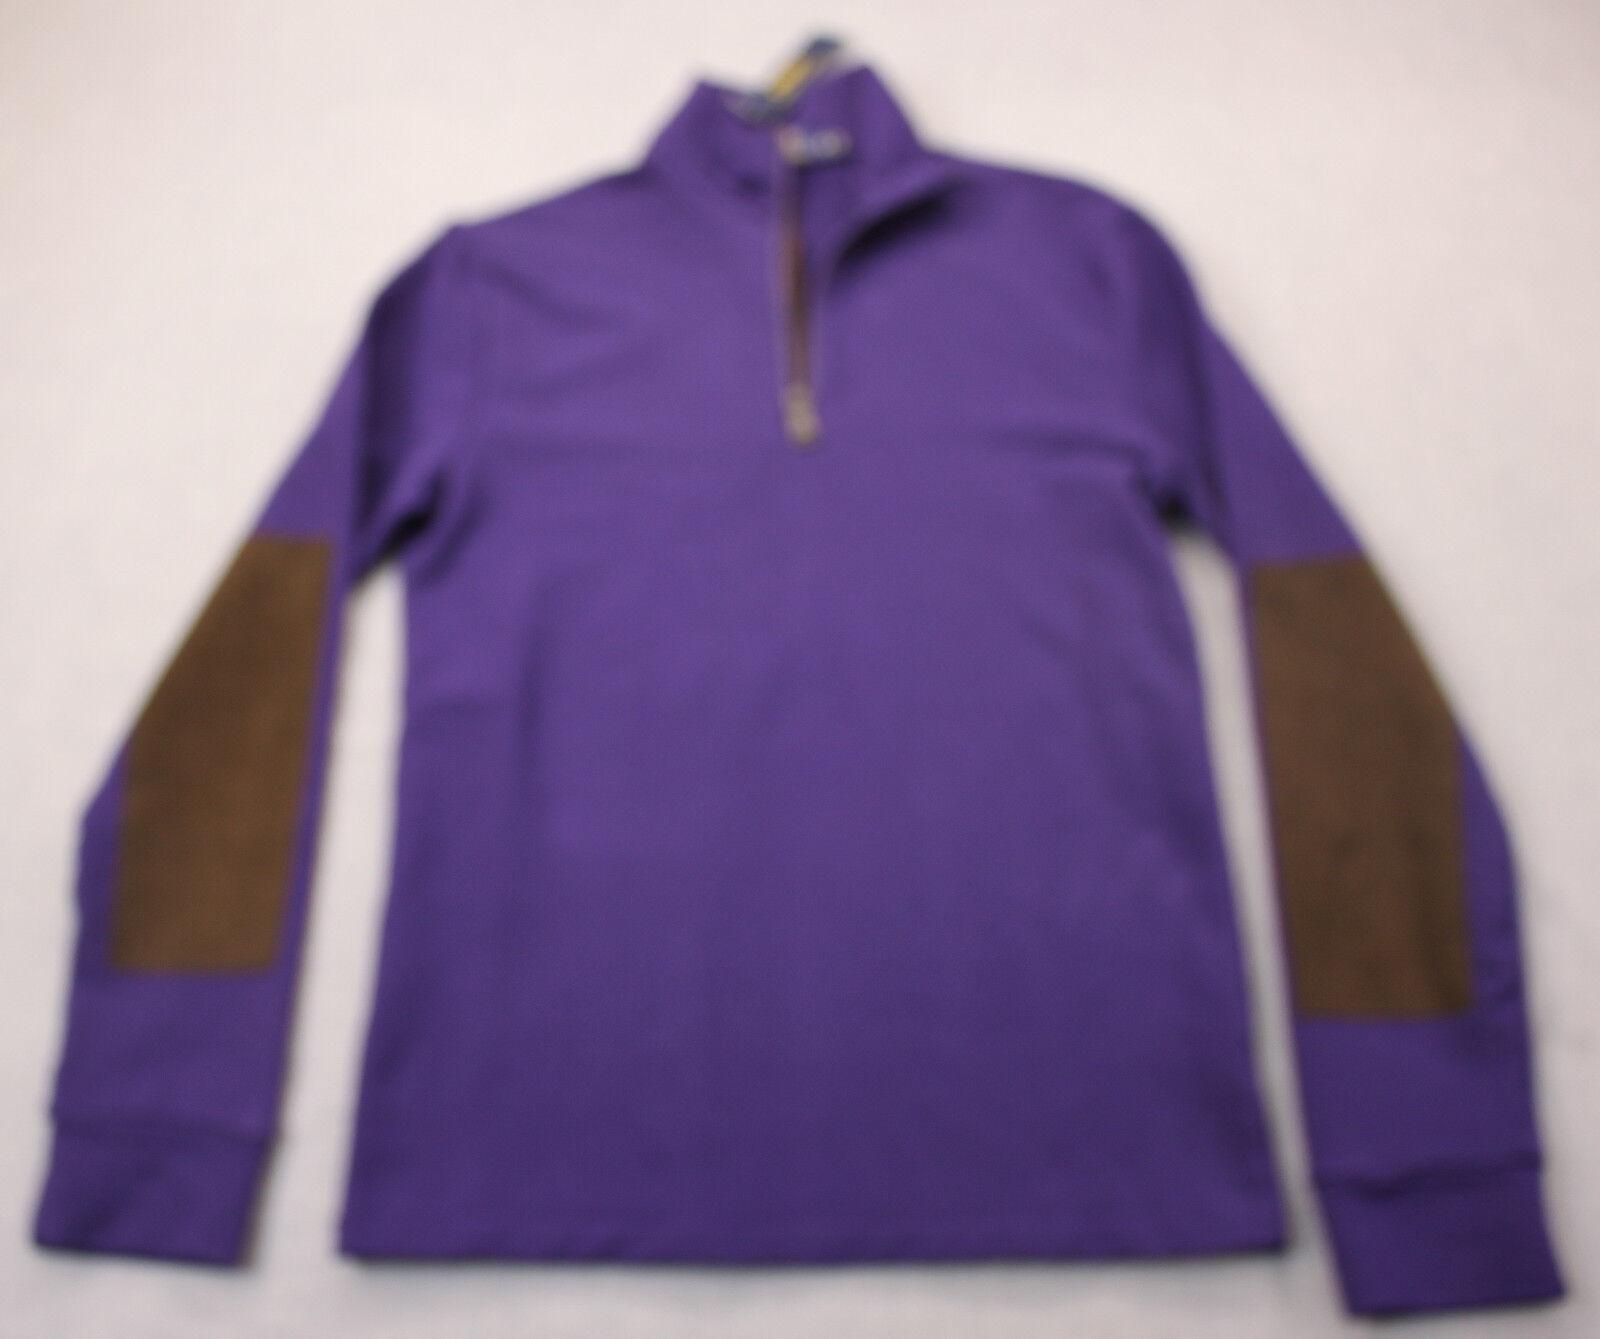 RALPH LAUREN POLO Mens Purple Leather Elbows Half Zip Stretch Sweater NWT S